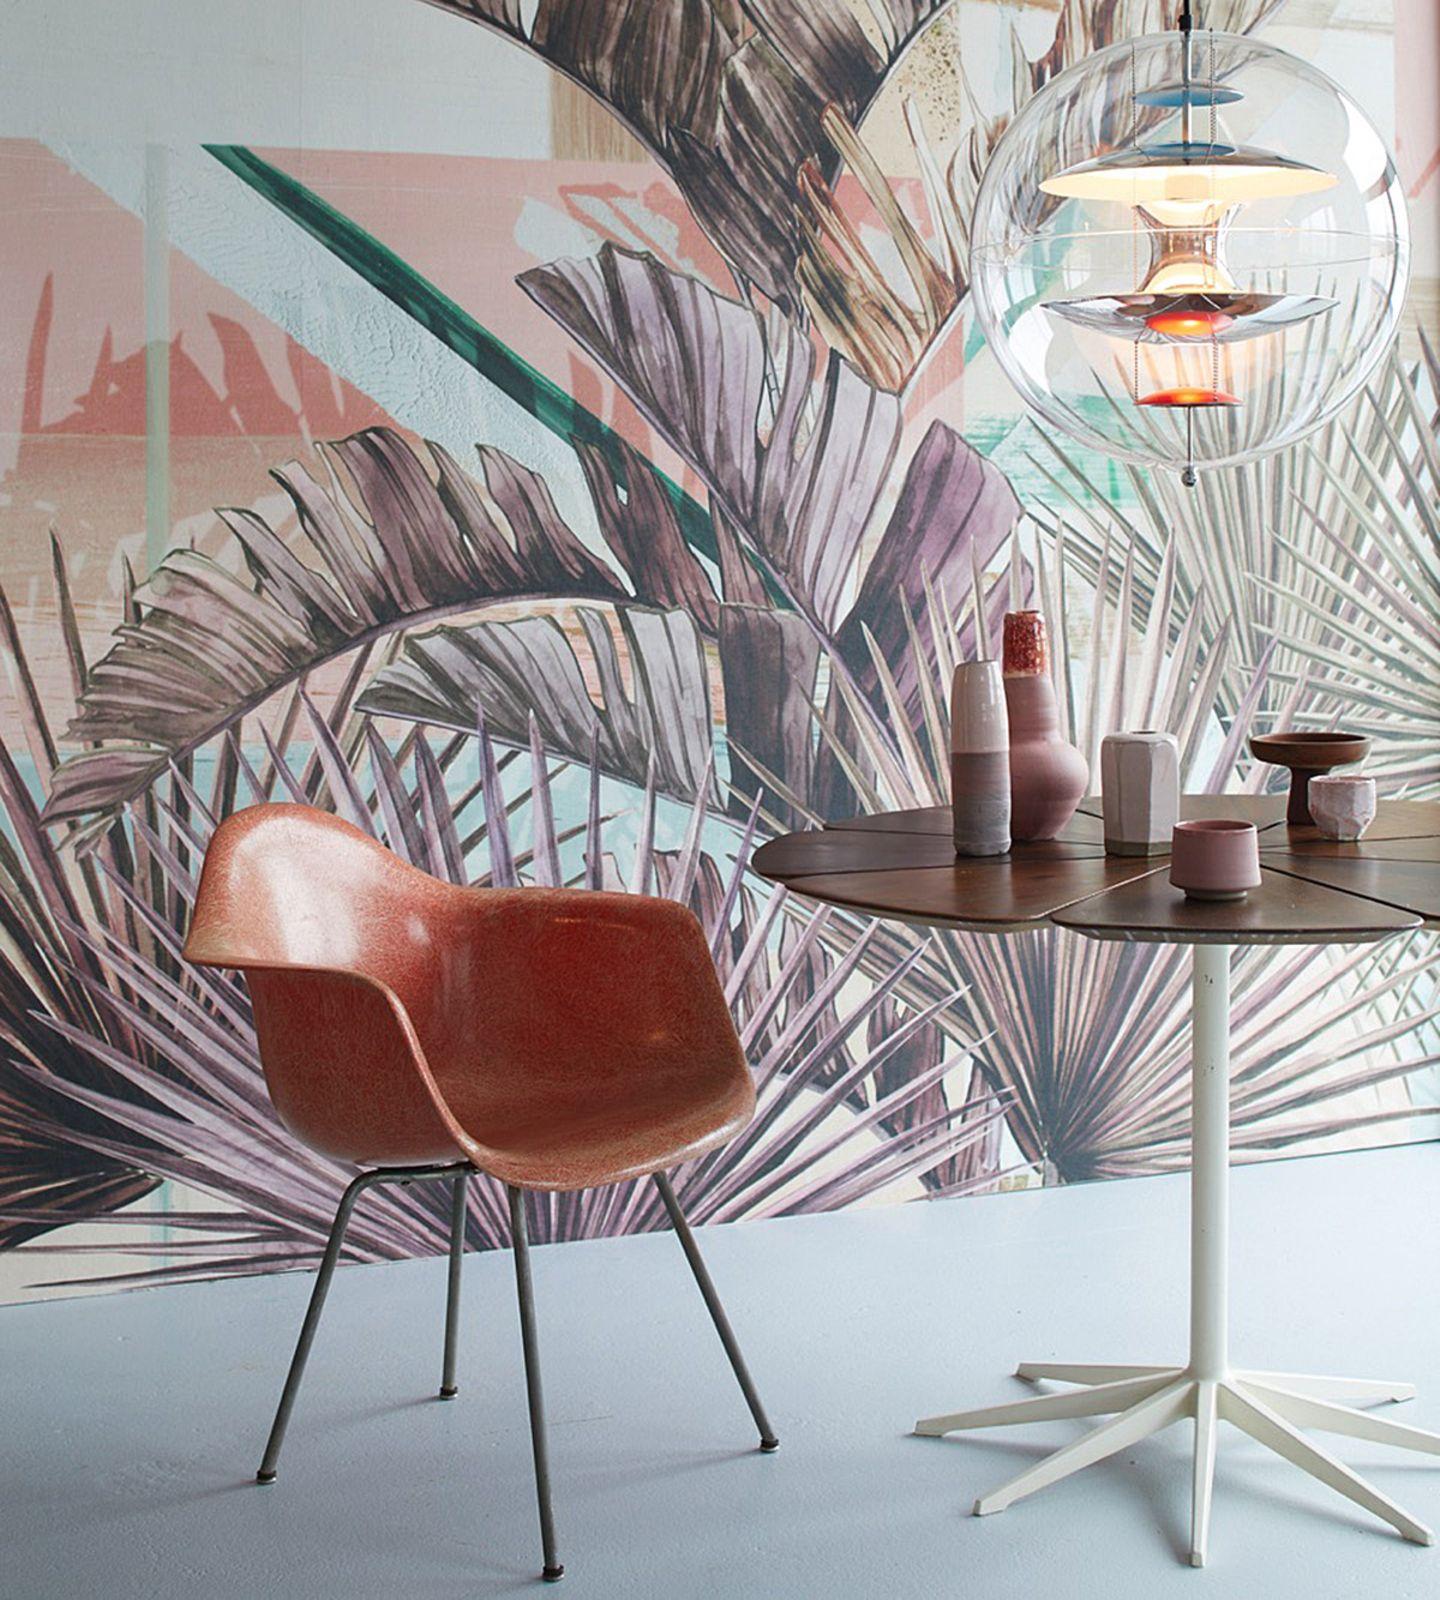 Tapete mit großformatigem Palmenmotiv